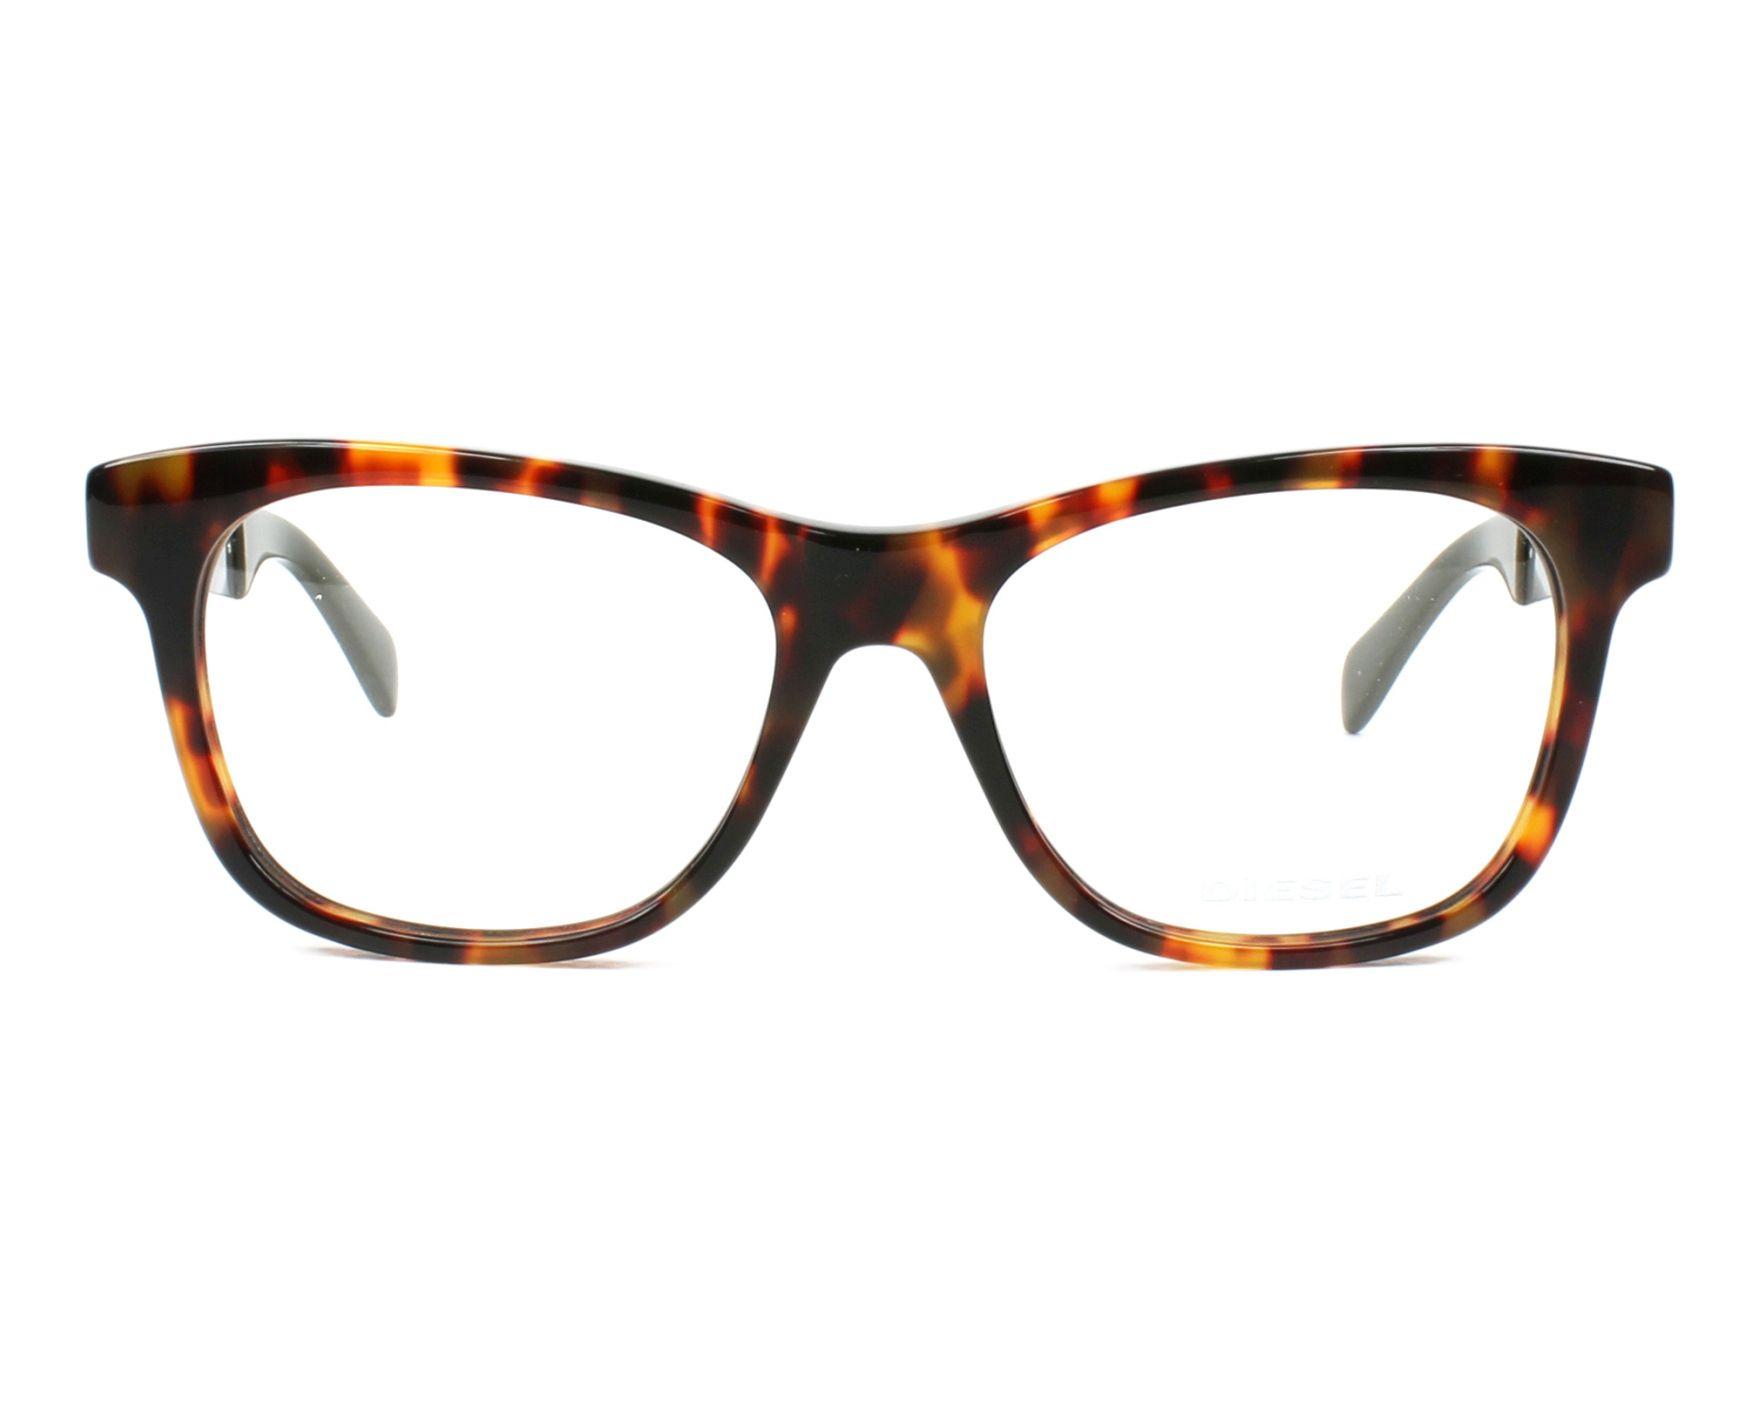 lunettes de vue de diesel en dl 5078 052. Black Bedroom Furniture Sets. Home Design Ideas